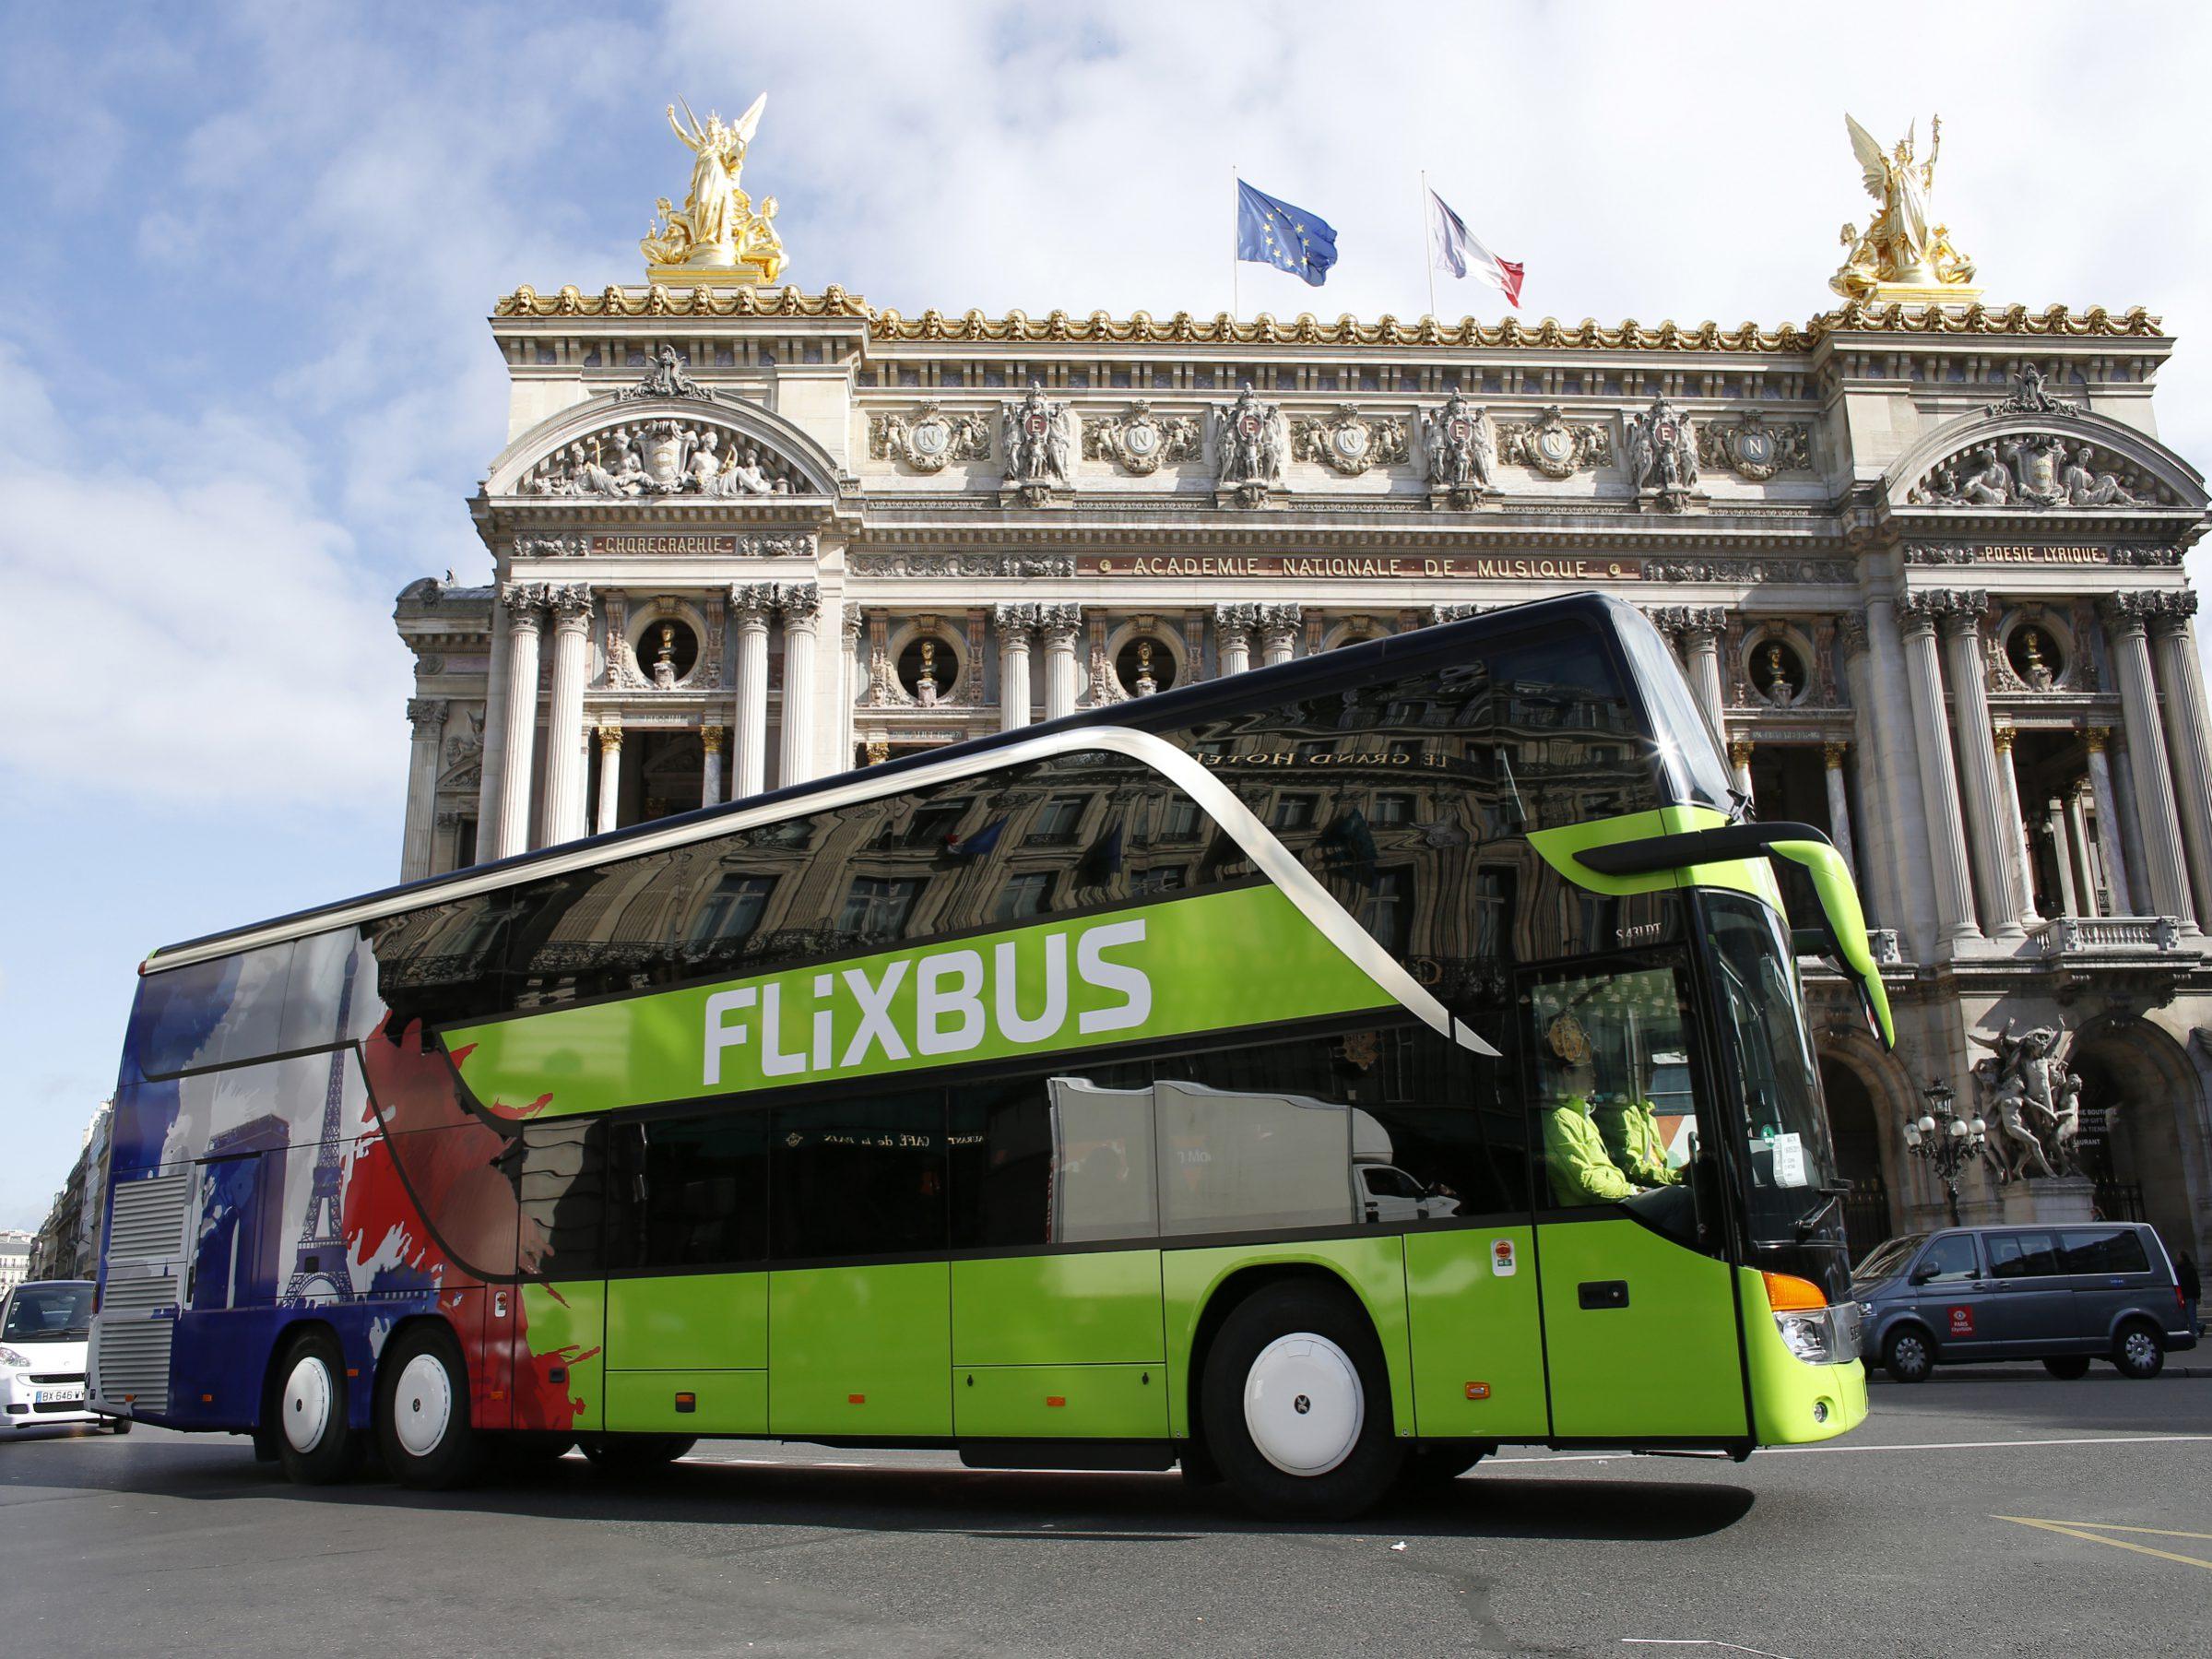 flixbus bernimmt postbus auf dem weg zum monopol. Black Bedroom Furniture Sets. Home Design Ideas